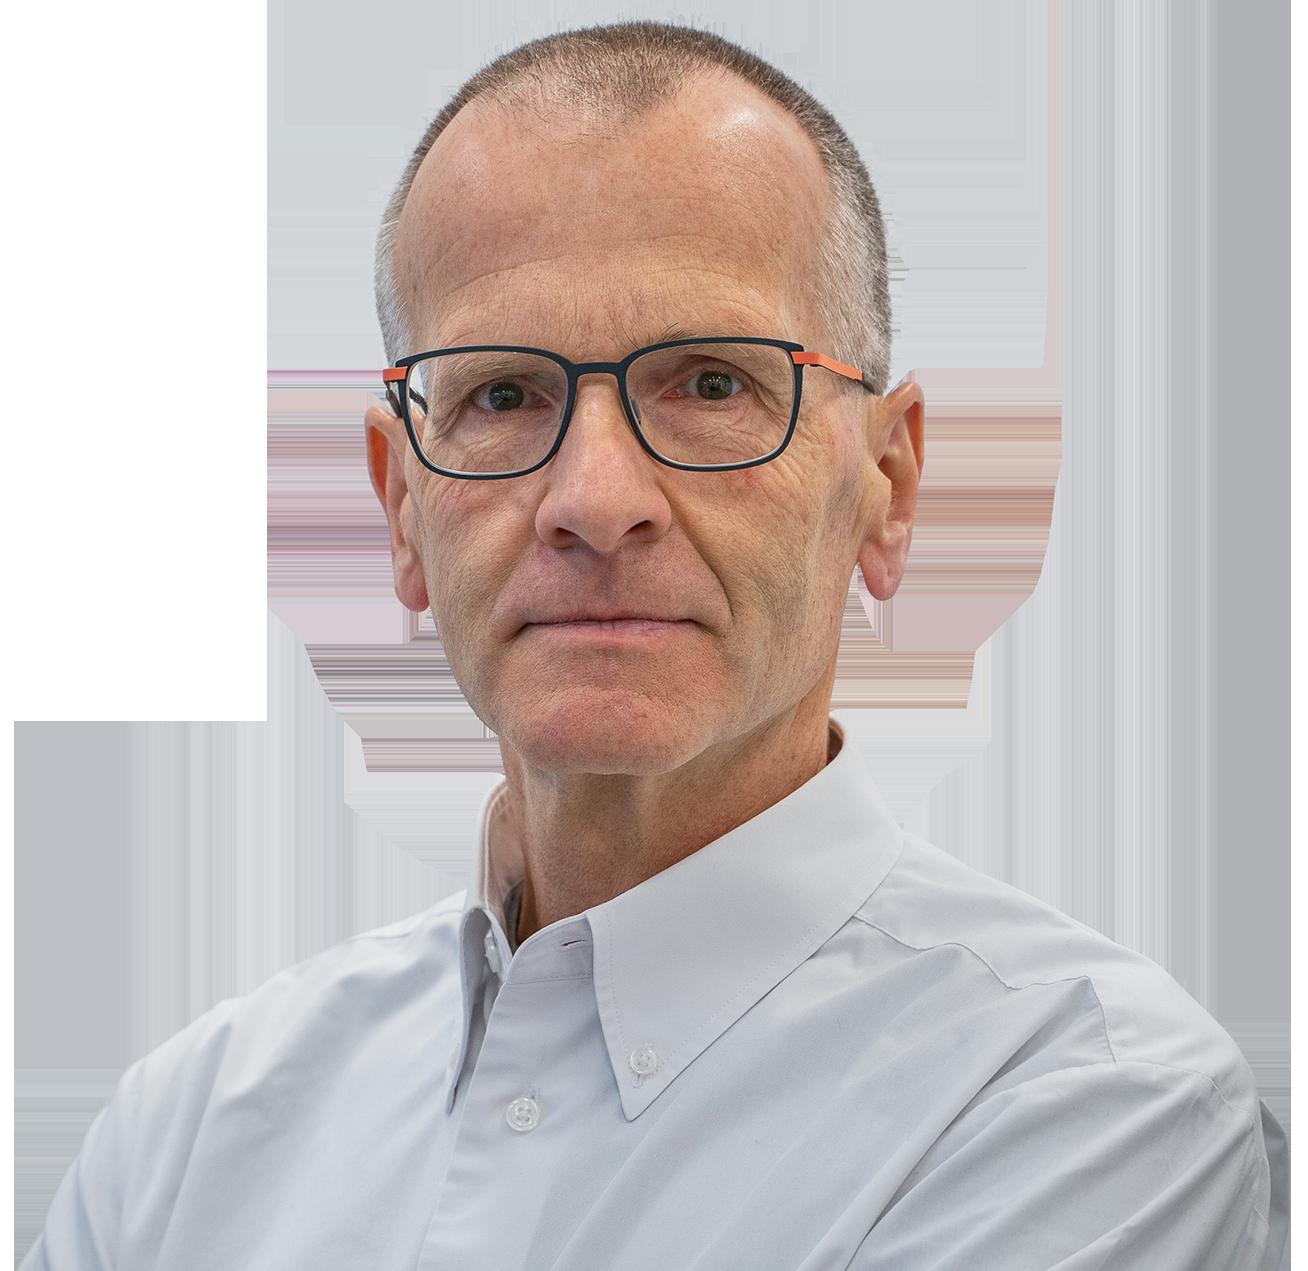 Daniel Röthlisberger